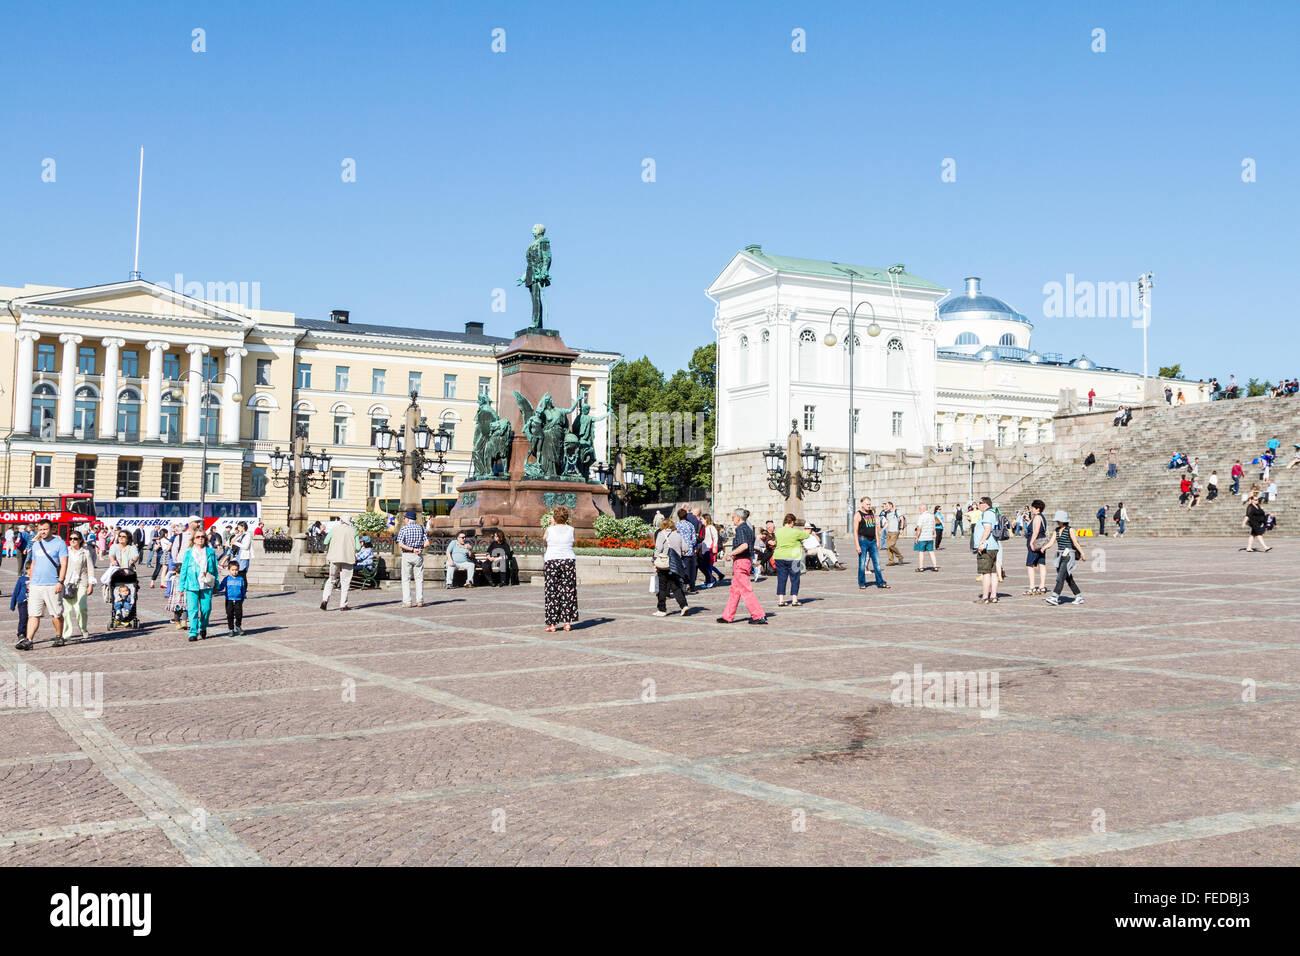 The Senate Square, Helsinki, Finland - Stock Image